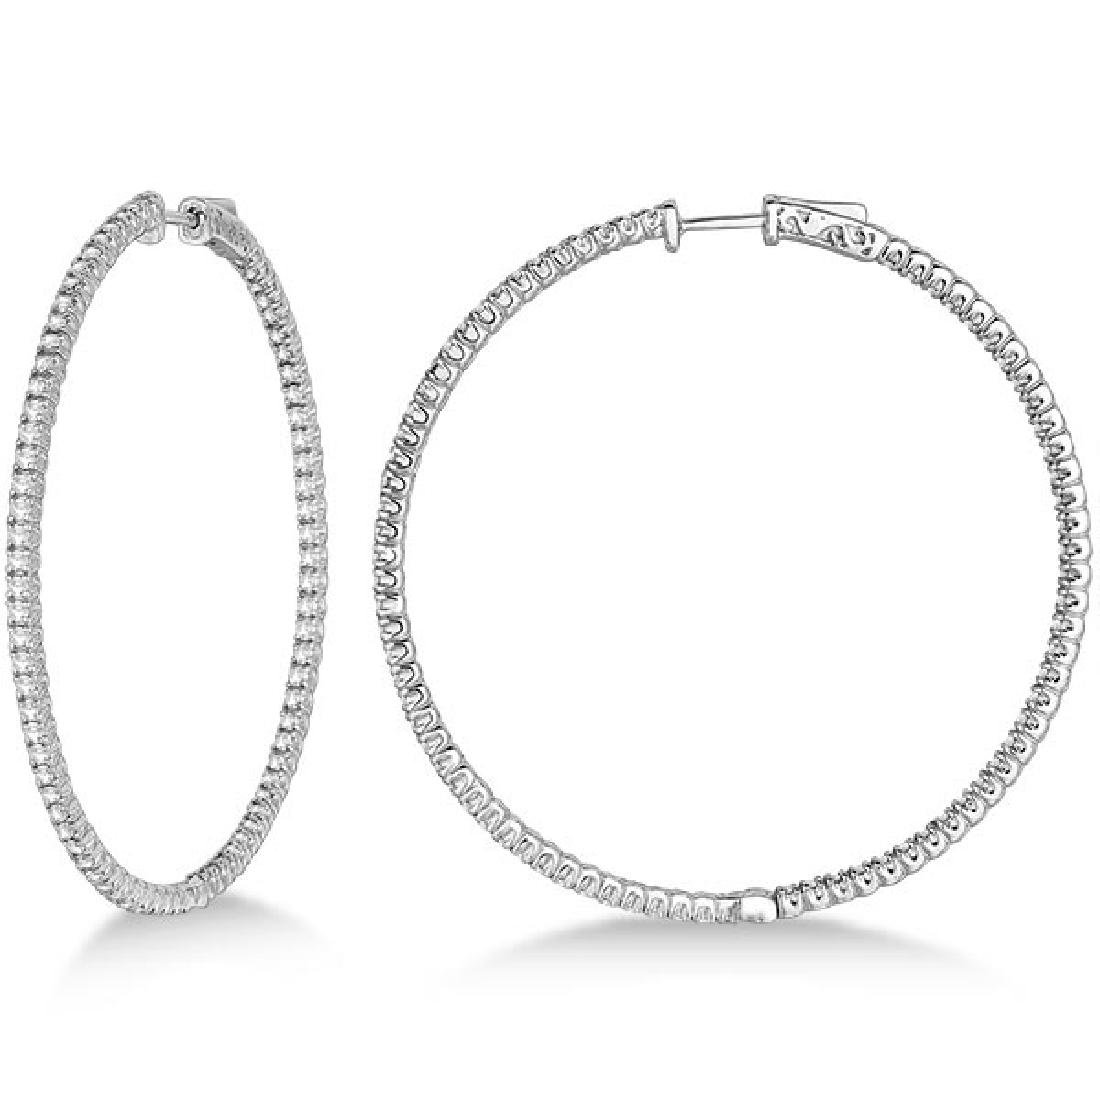 Unique X-Large Diamond Hoop Earrings 14k White Gold (3.